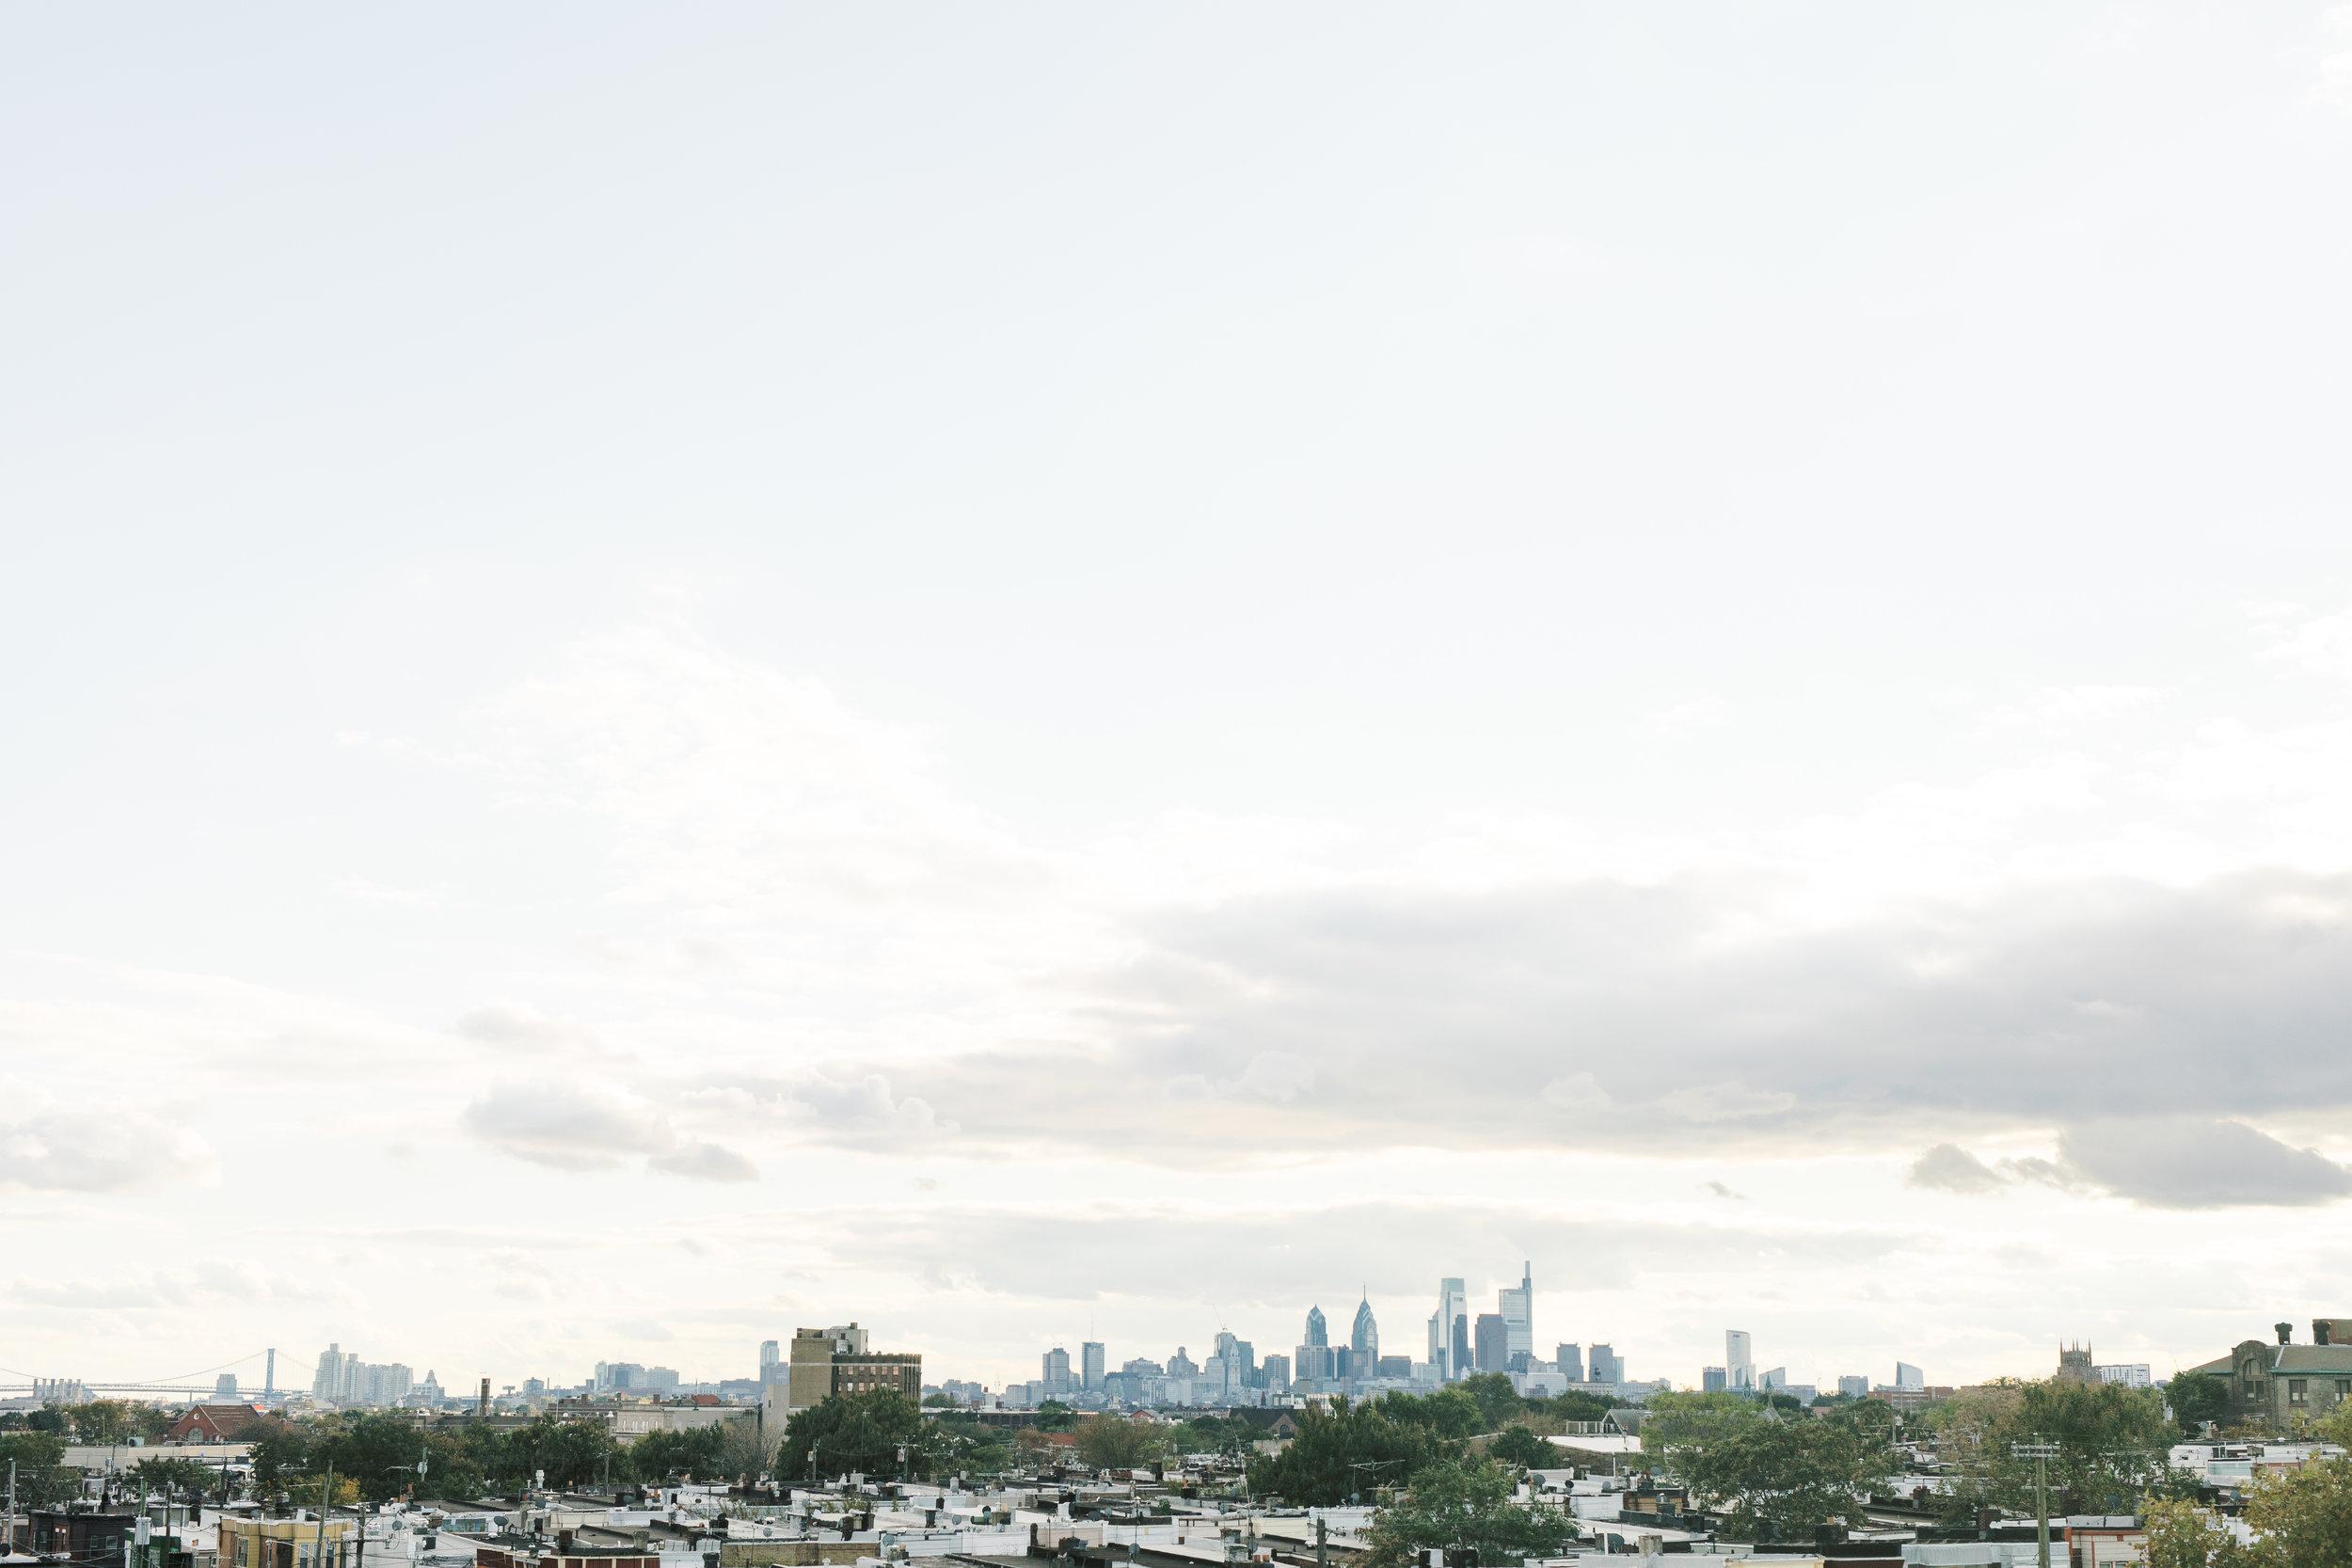 skyline view of Philadelphia from FAME, an industrial and modern Philadelphia wedding venue